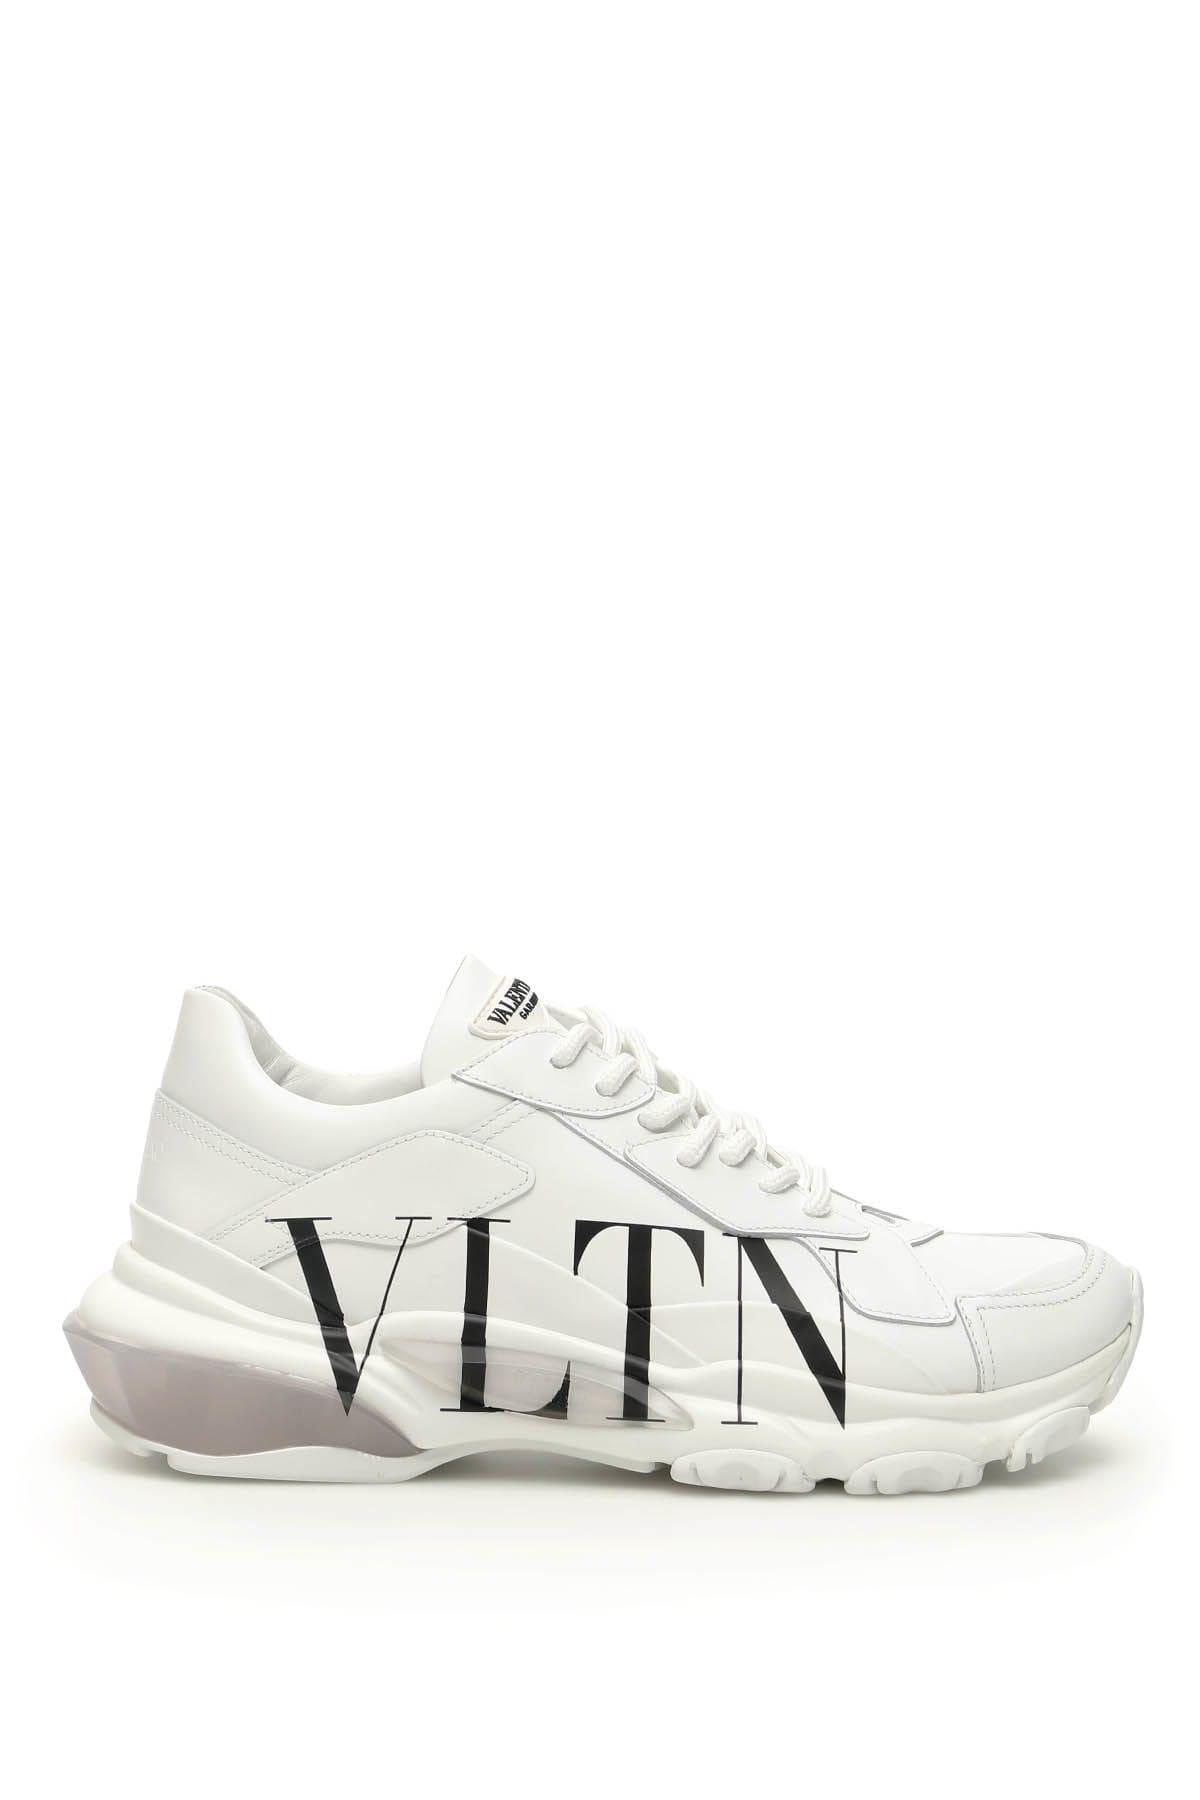 Valentino Garavani Vlogo Bounce Sneakers